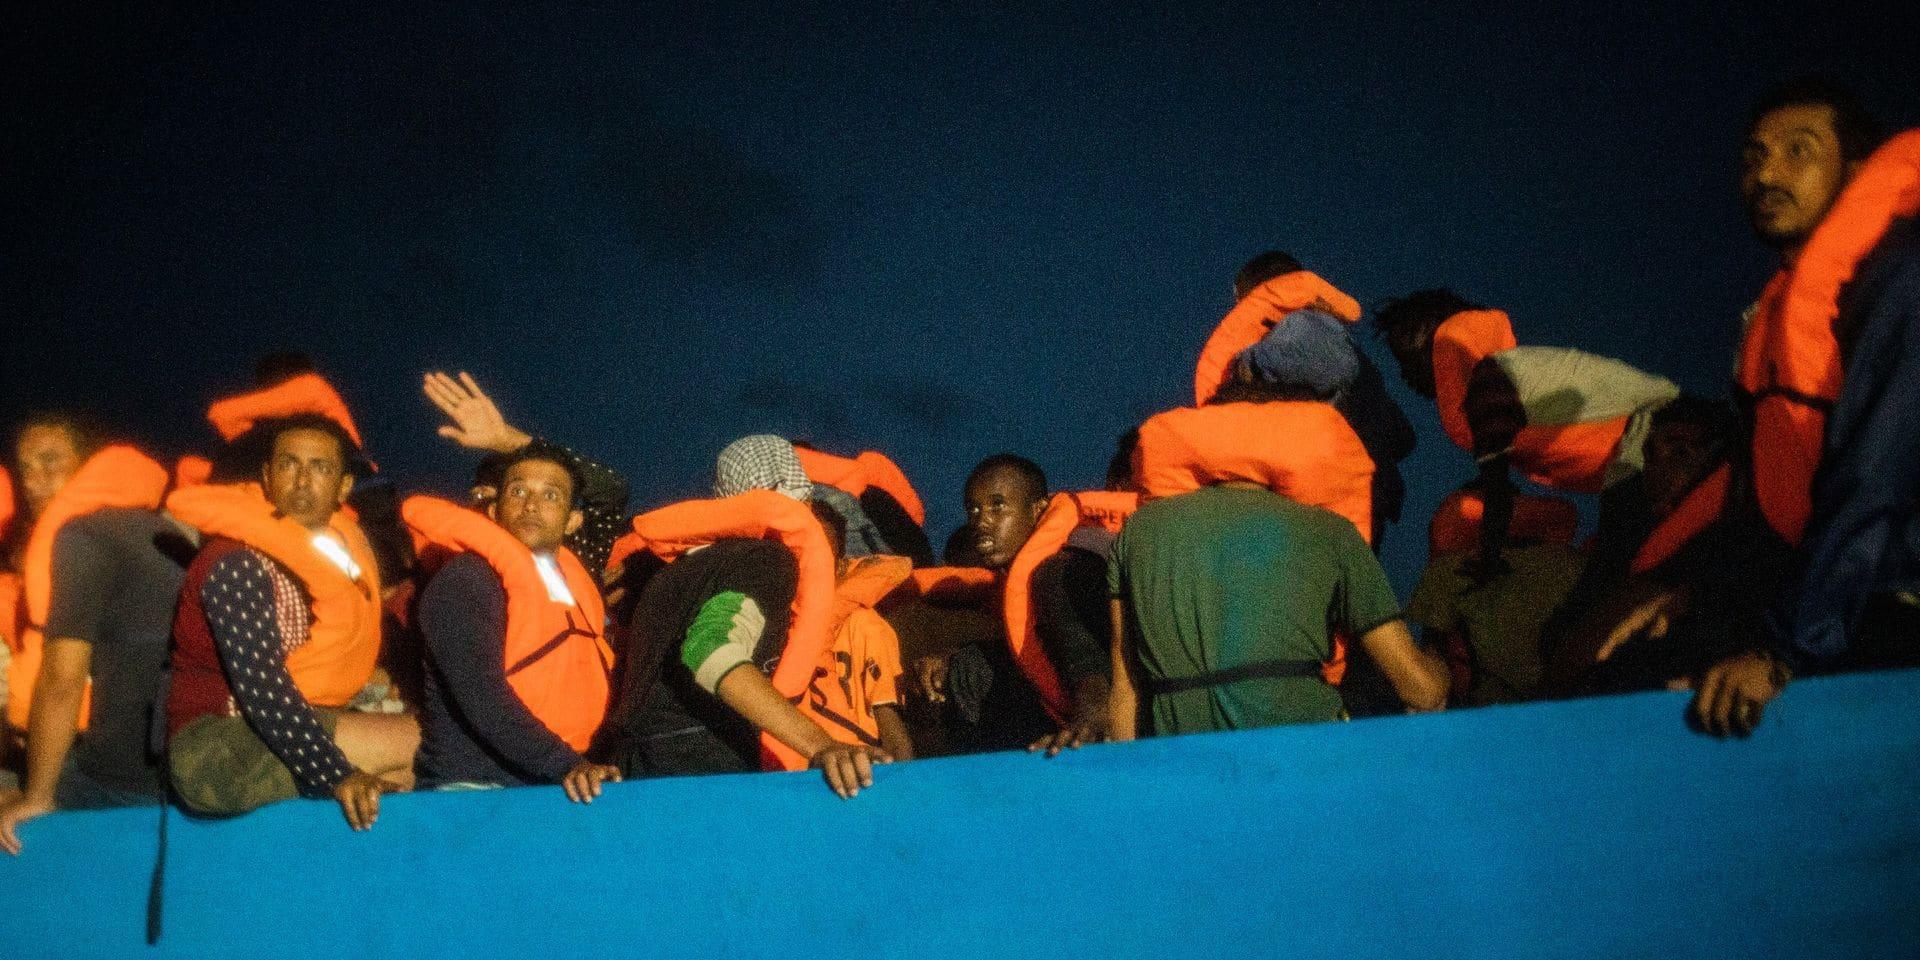 Libye: 575 migrants secourus en Méditerranée en une semaine